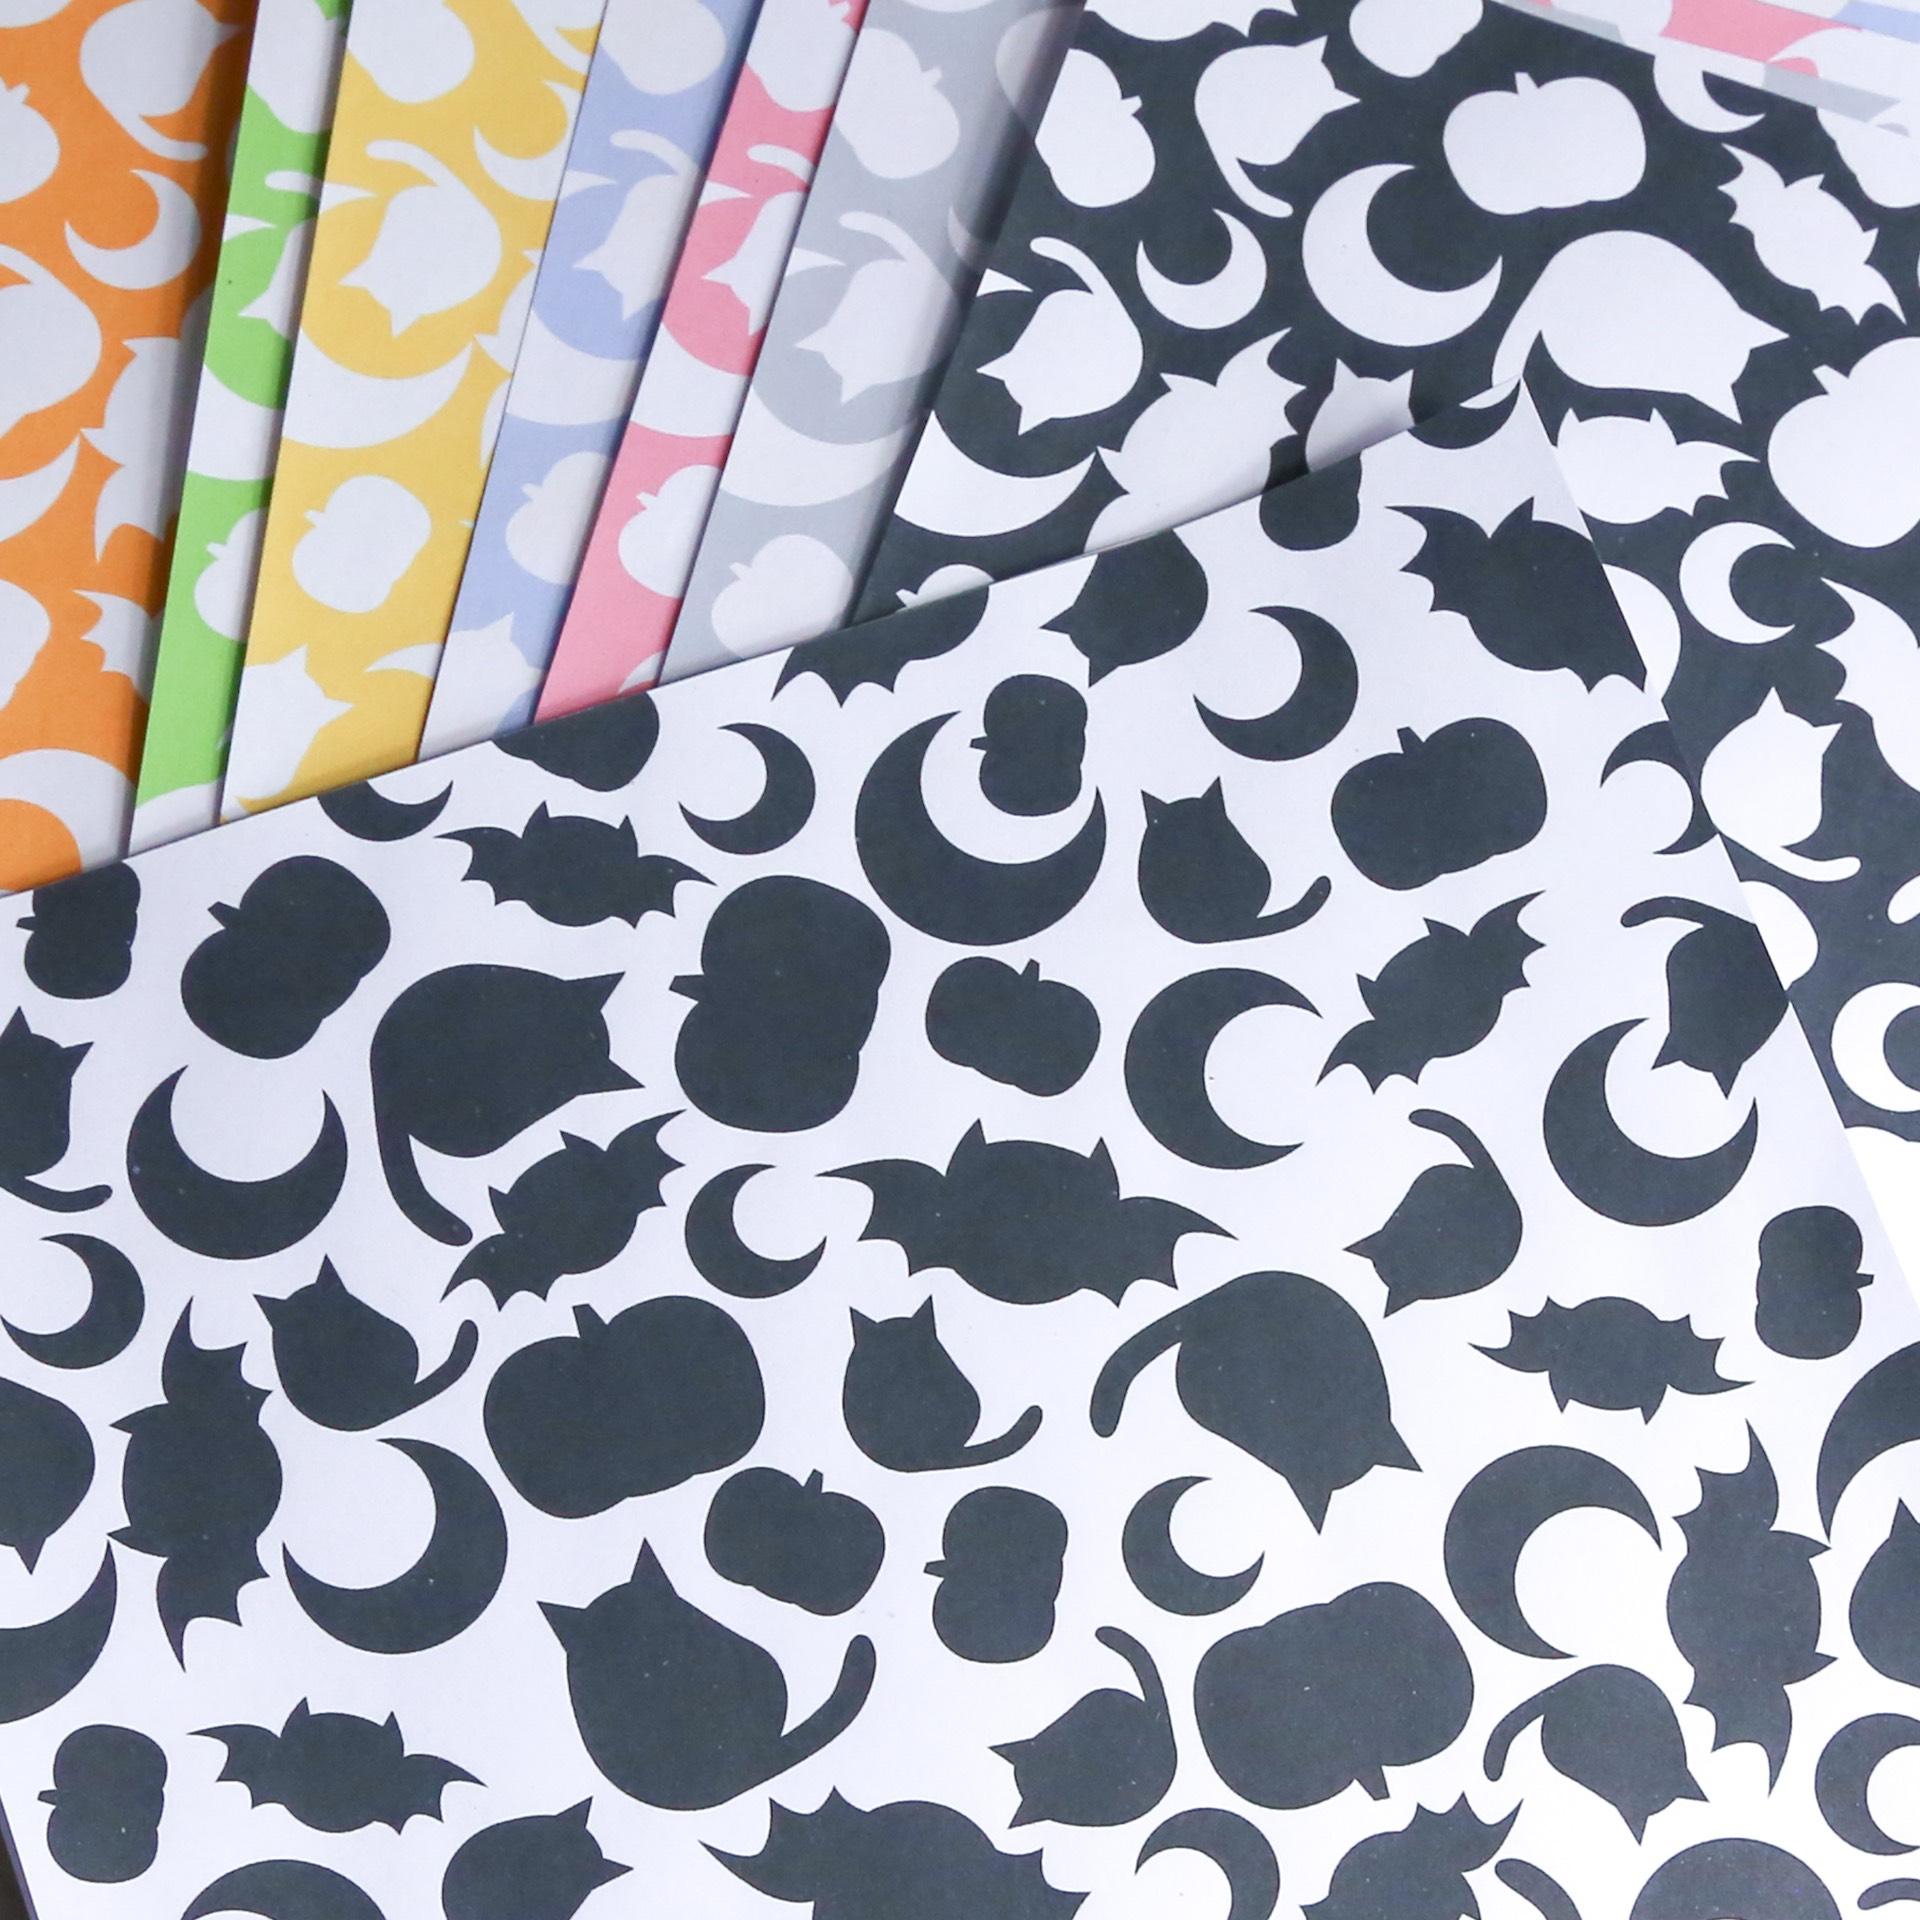 Cute Halloween Printable Origami Paper - Paper Kawaii Shop - photo#31